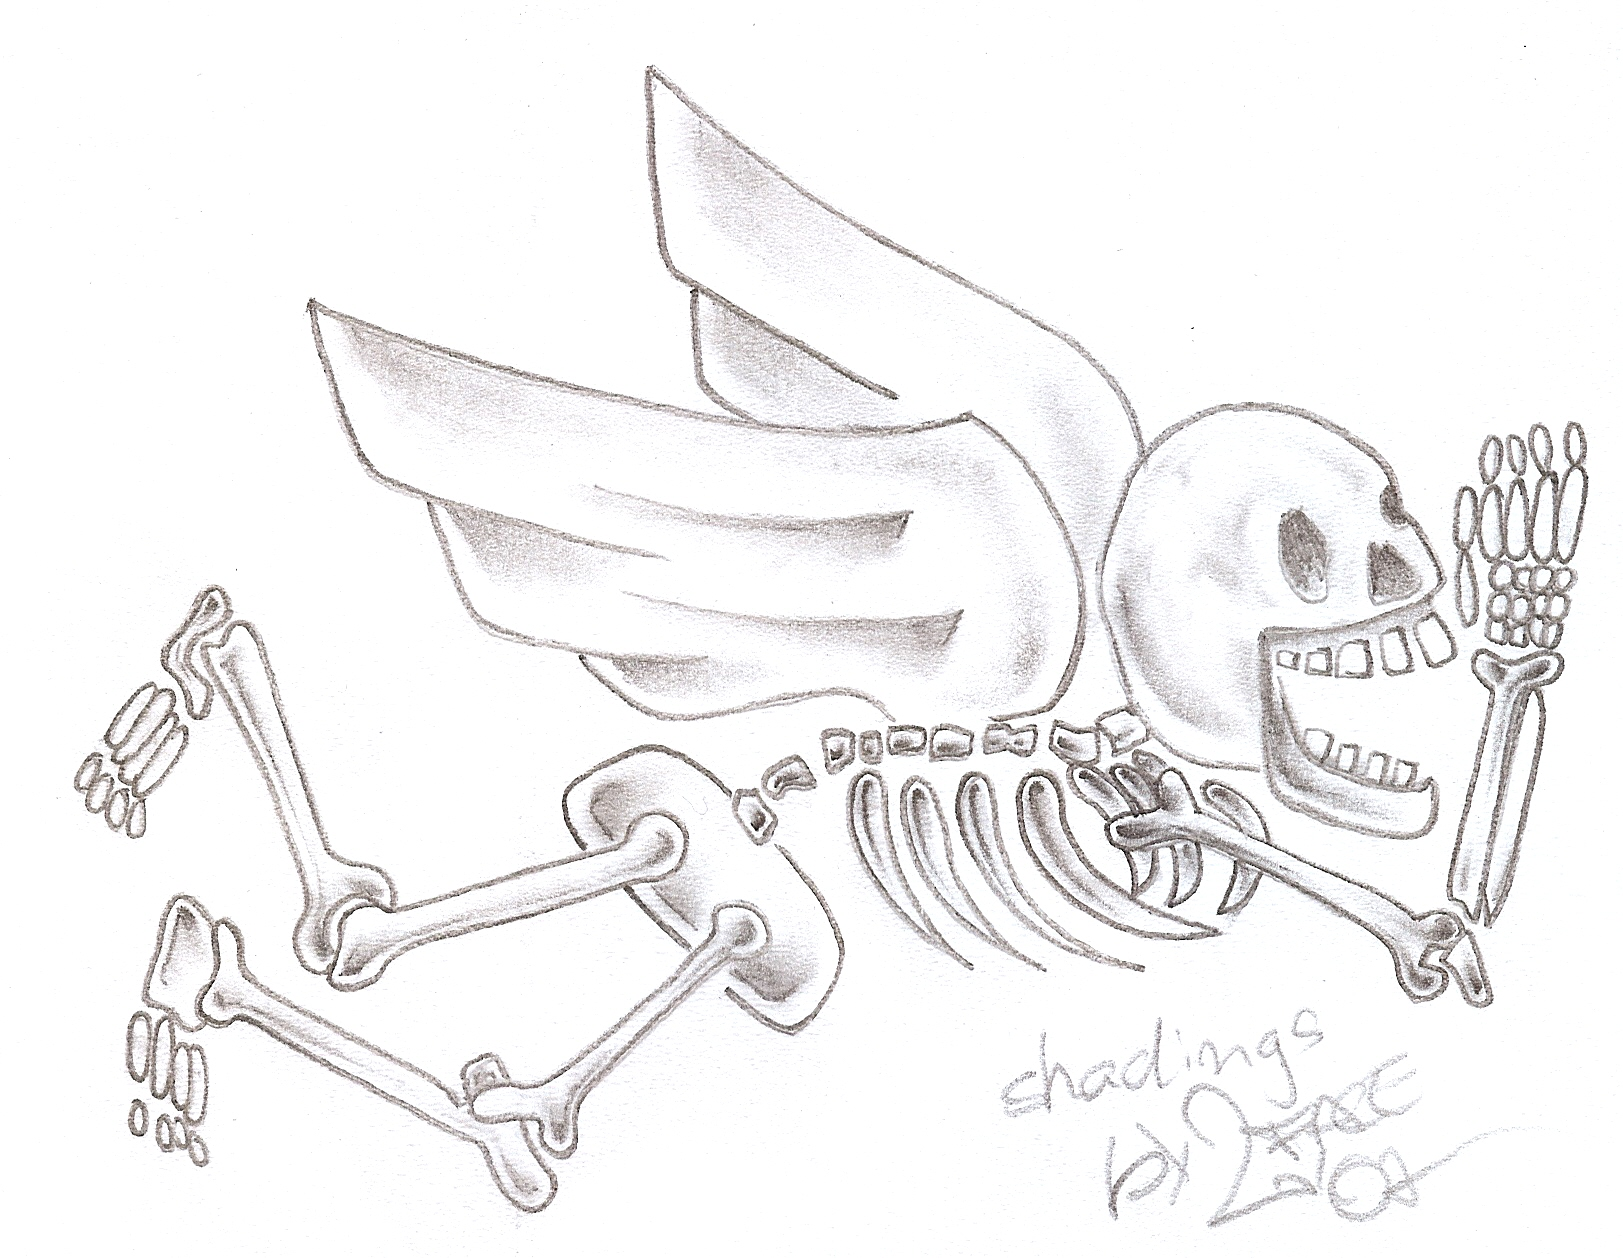 Onkelz flying Skeleton Tattoo